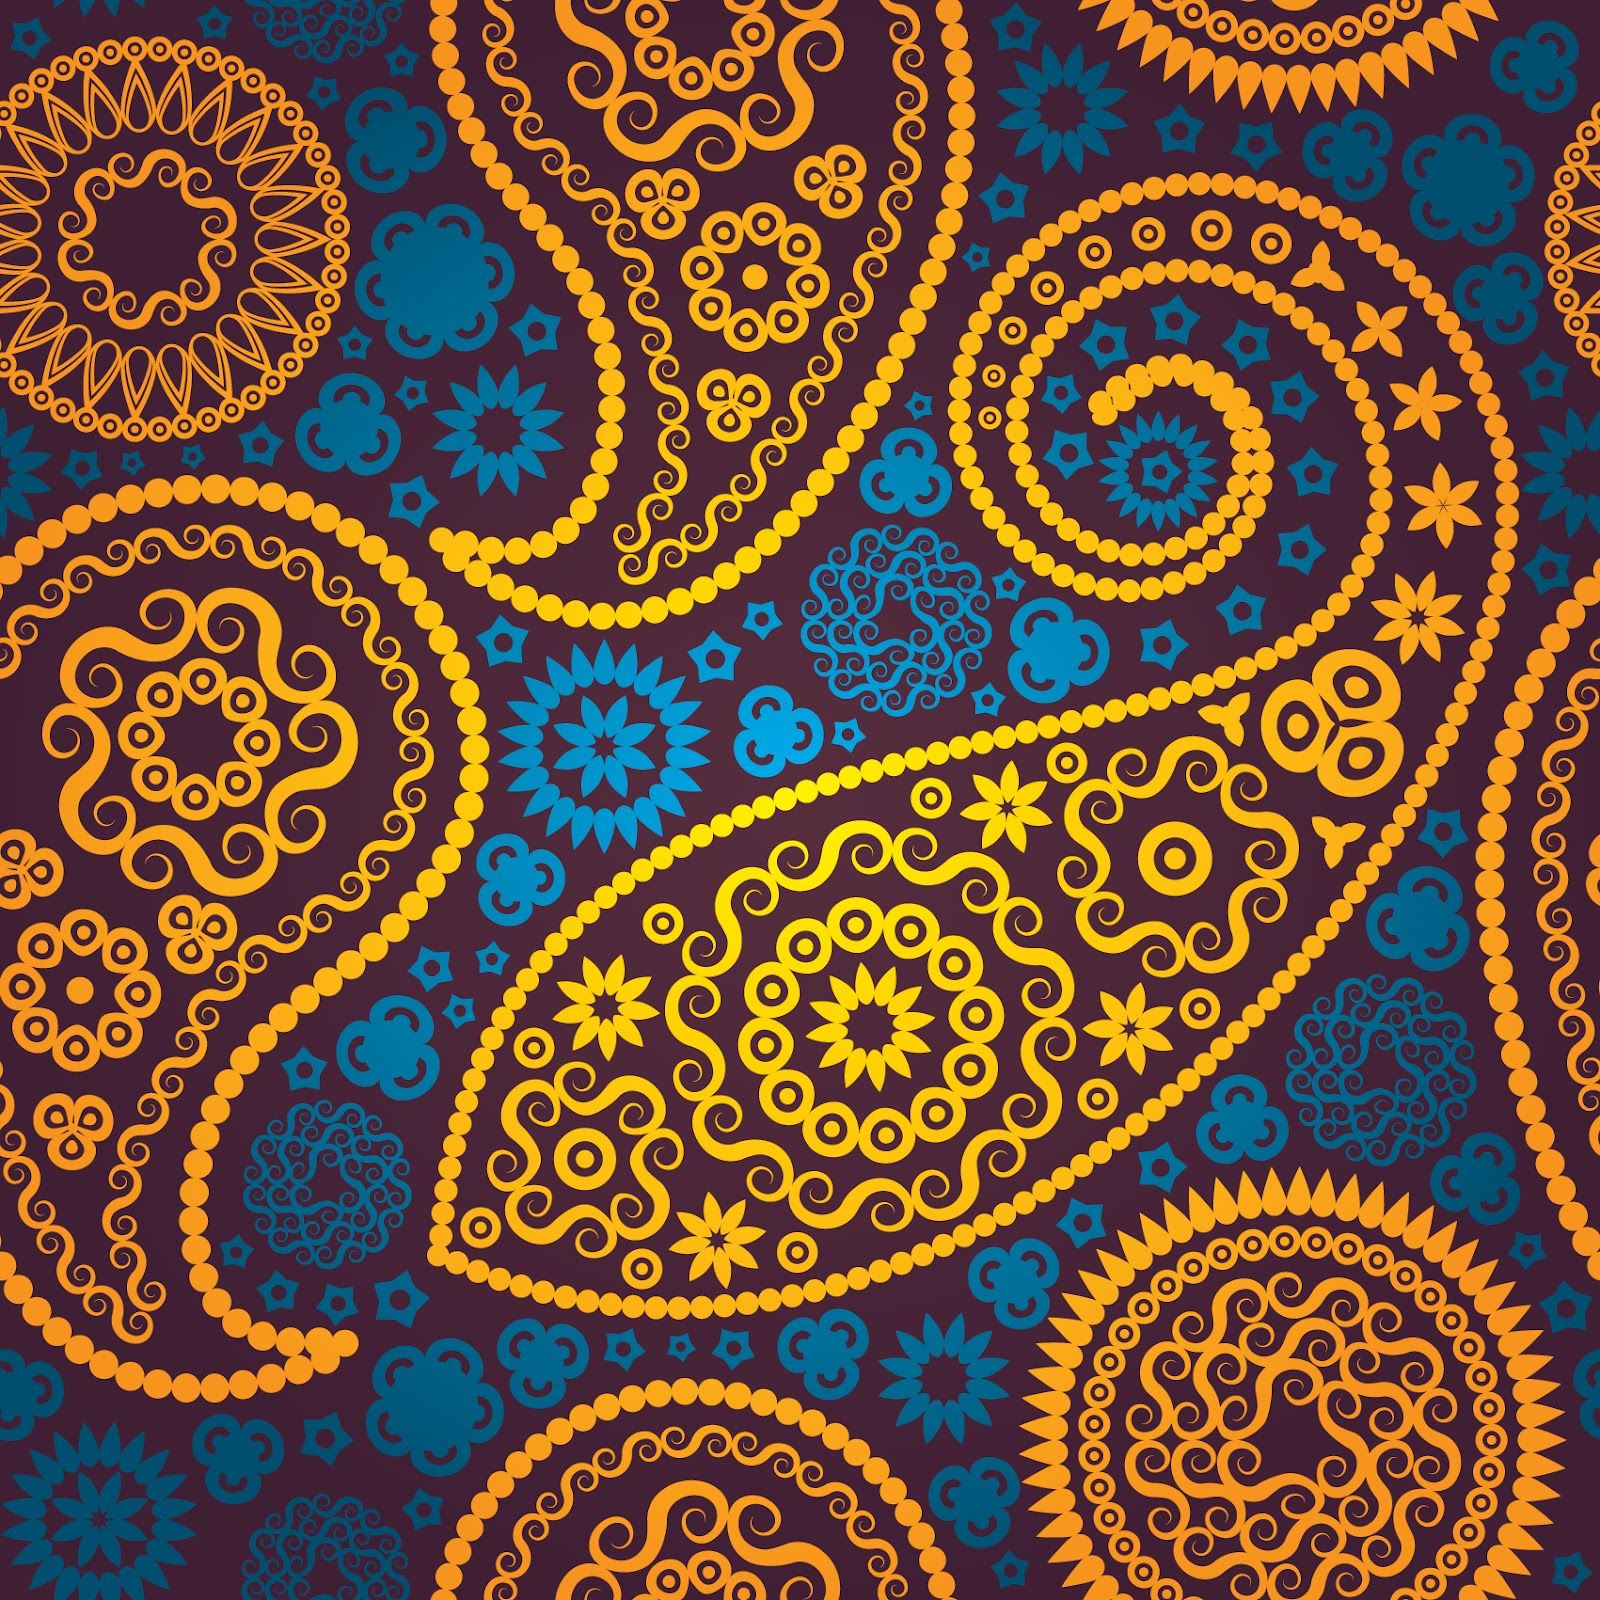 paisley paisley designpaisley patternindian patternsfloral patternsvector free downloadzentanglegroundsgraphic artcommercial